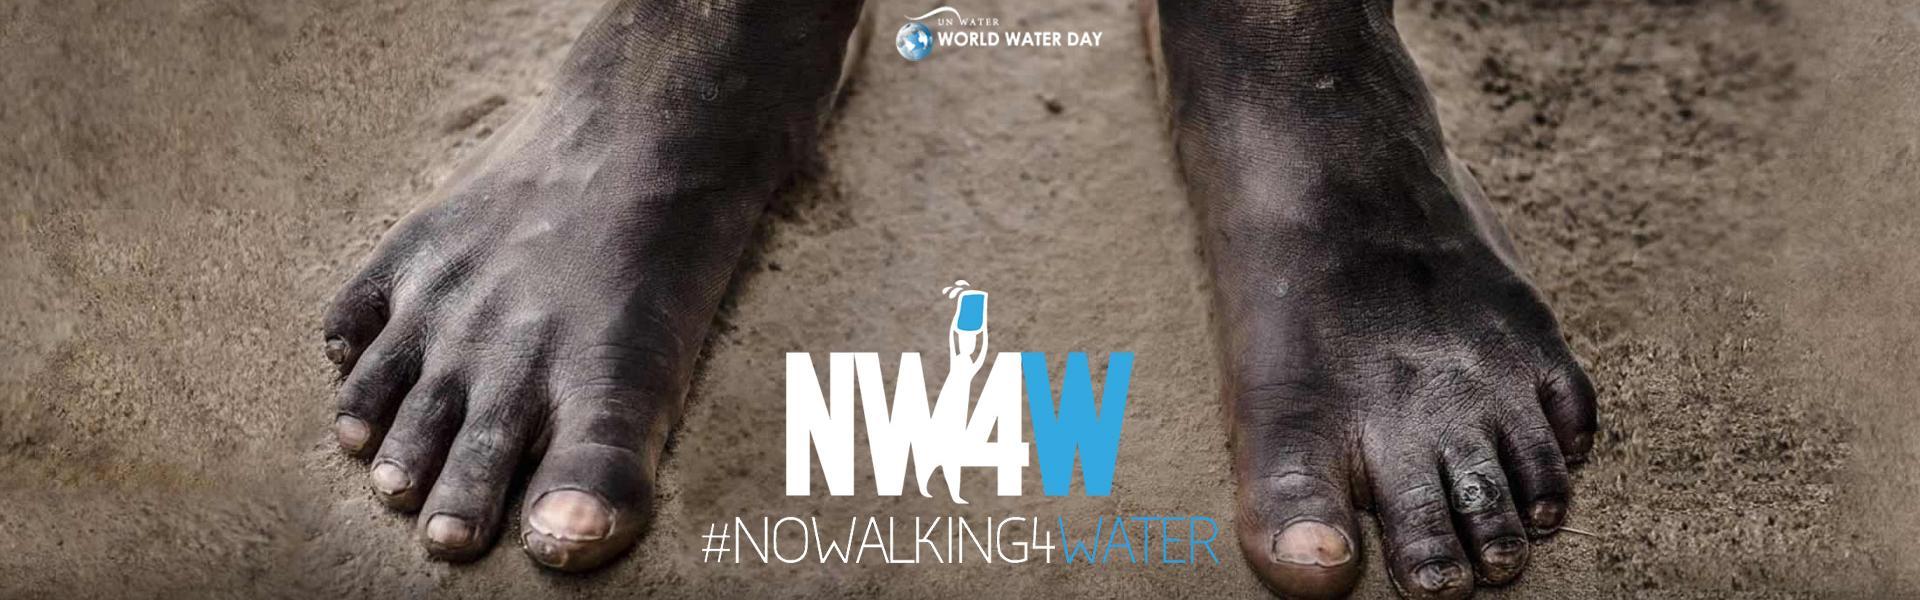 No Walking 4 Water - News